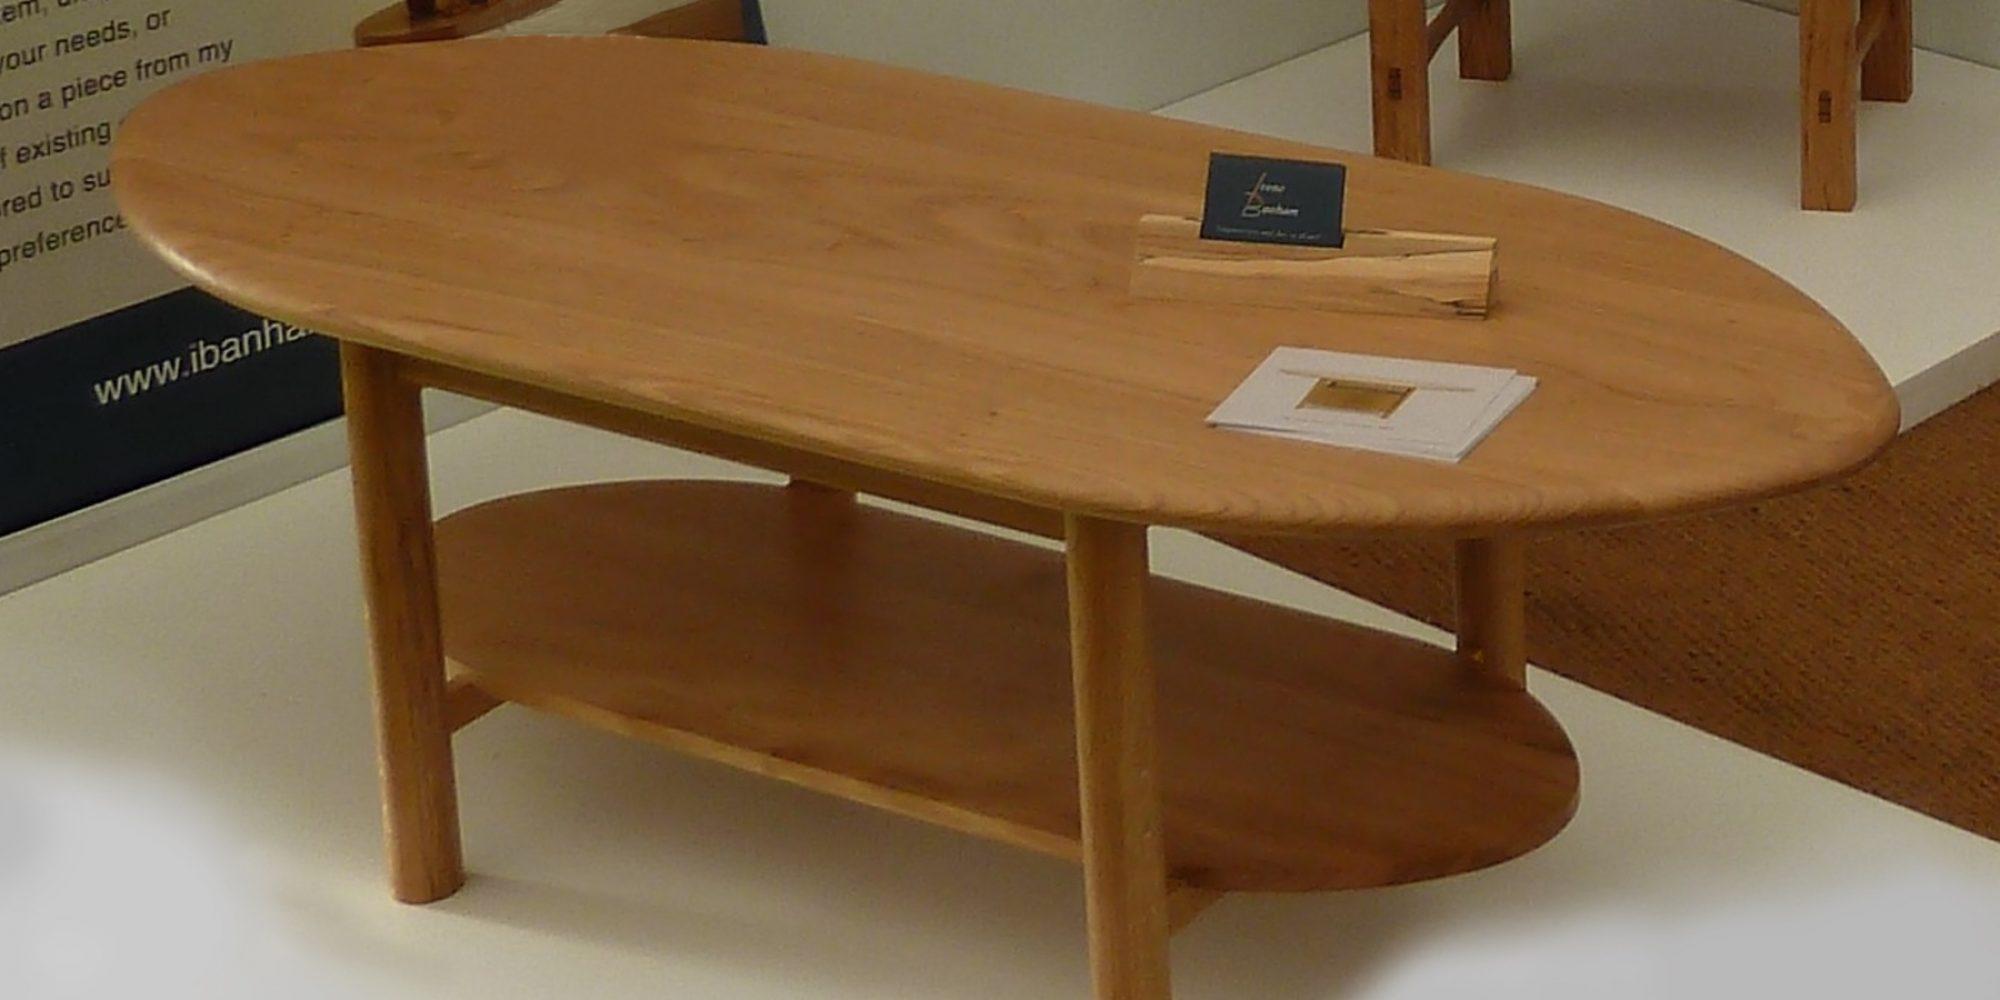 Large Oak Coffee Table with shelf